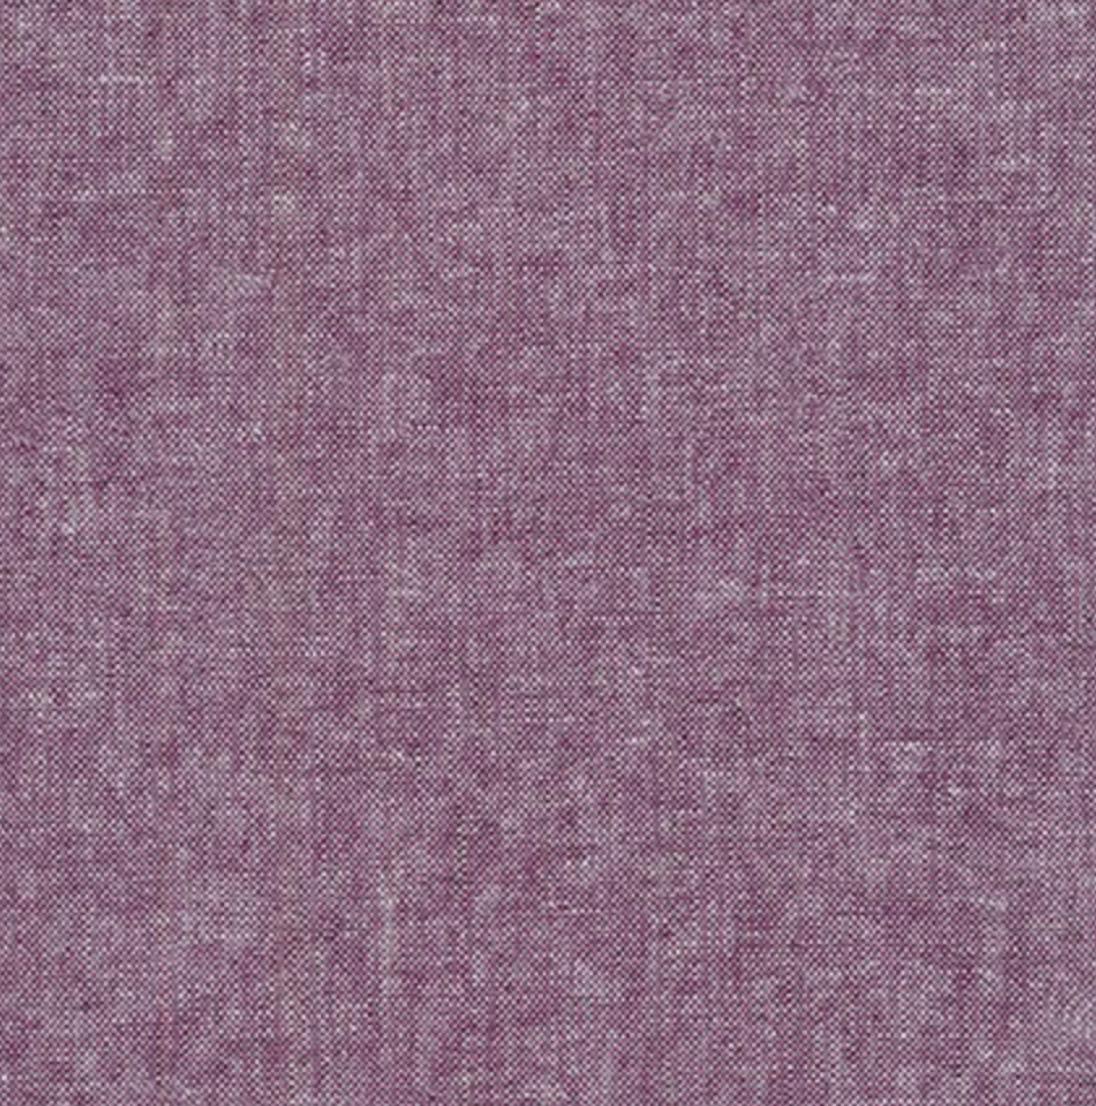 Eggplant - Essex Yarn Dyed - Robert Kaufman